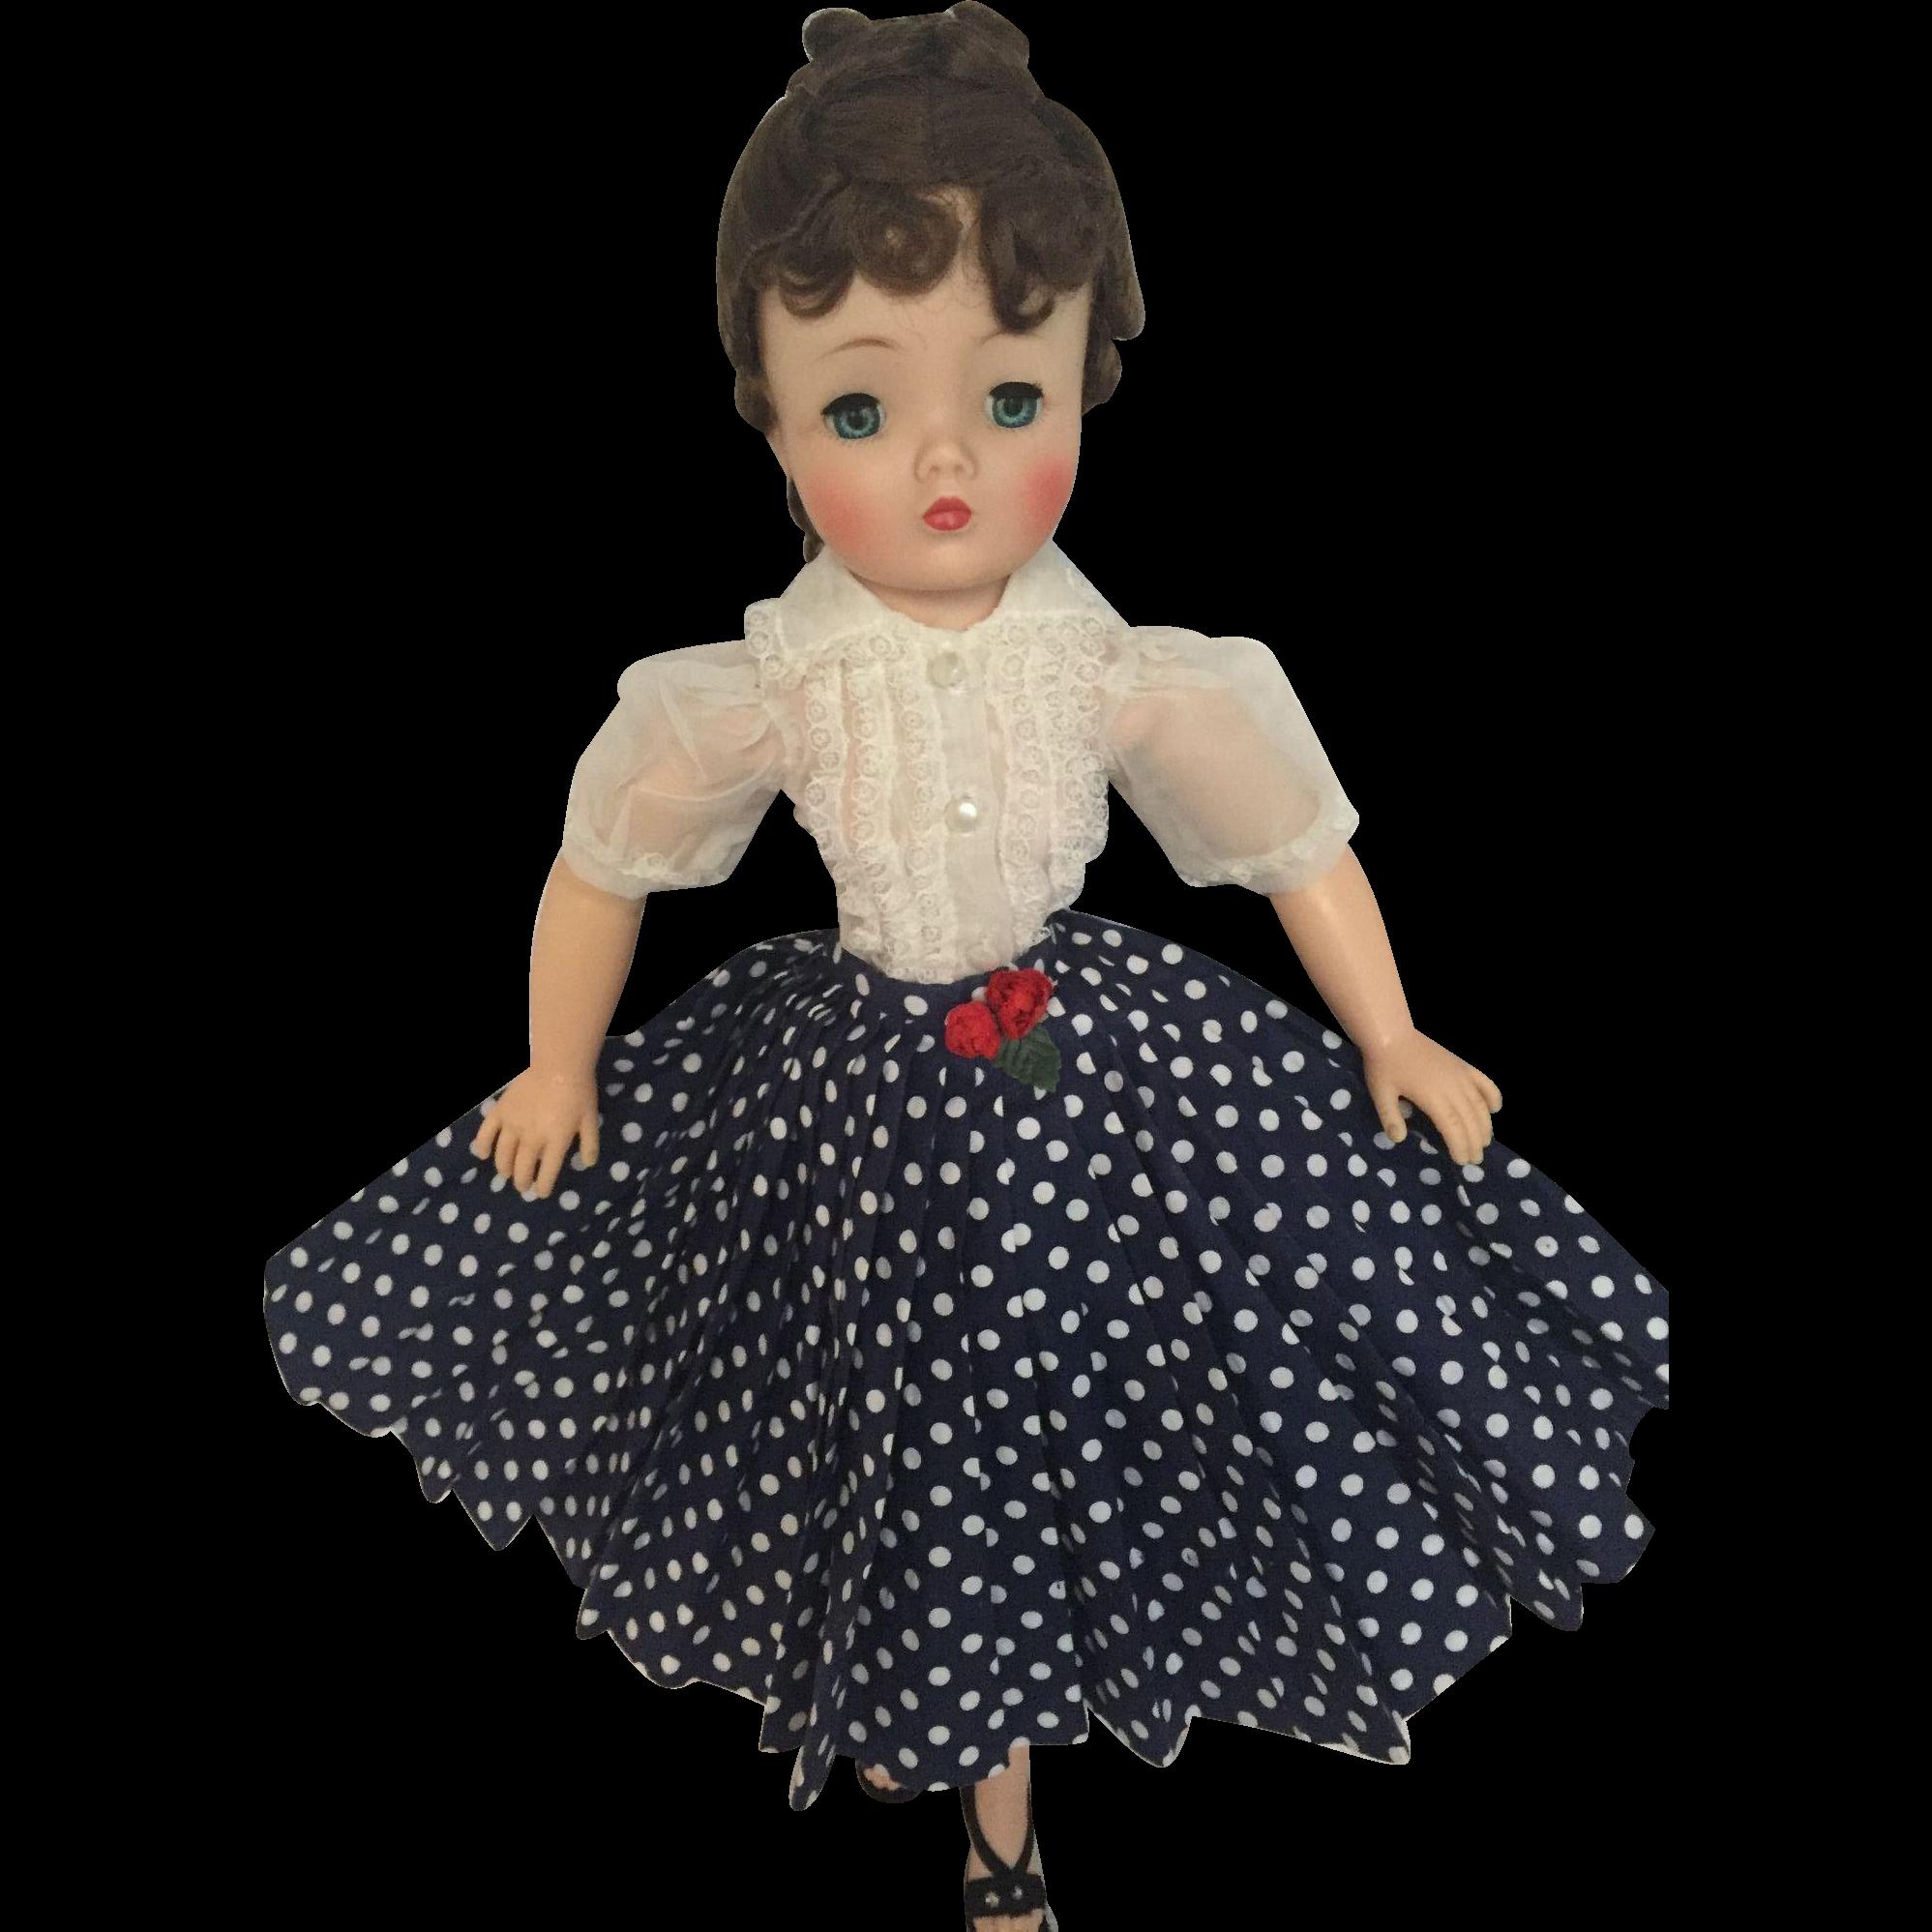 Vintage Cissy outfit